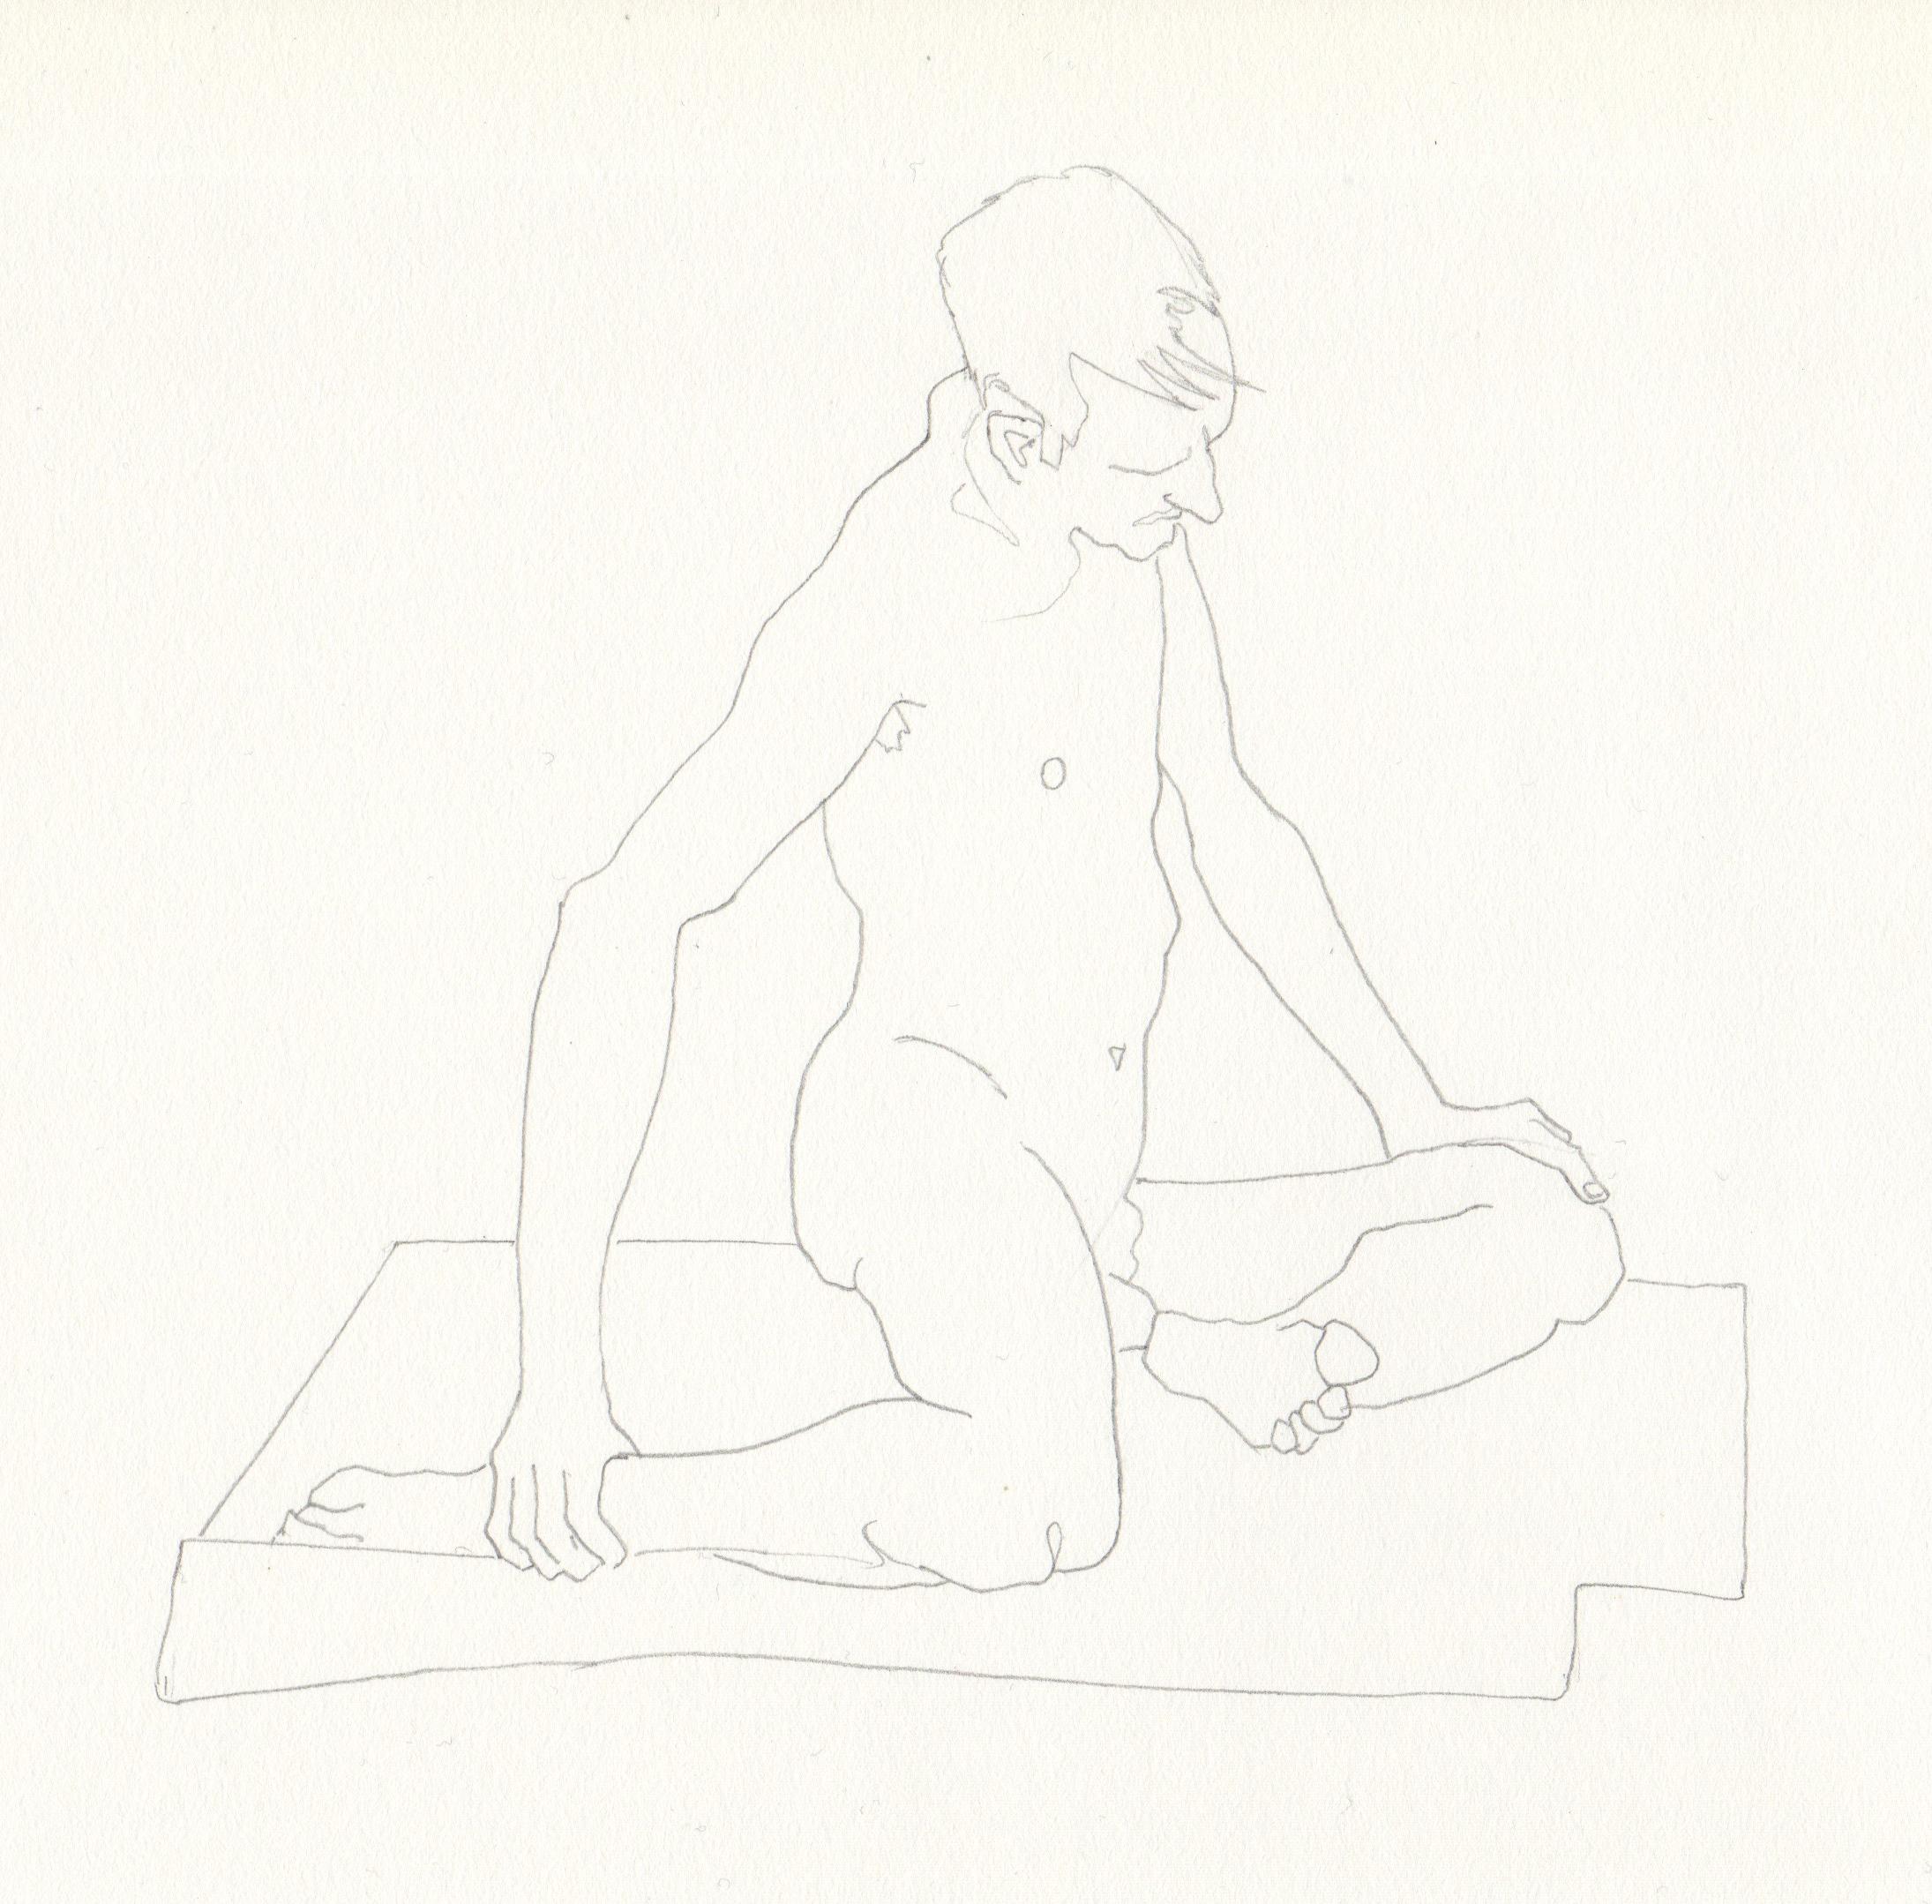 2012_Sketch_F-Beudin_033